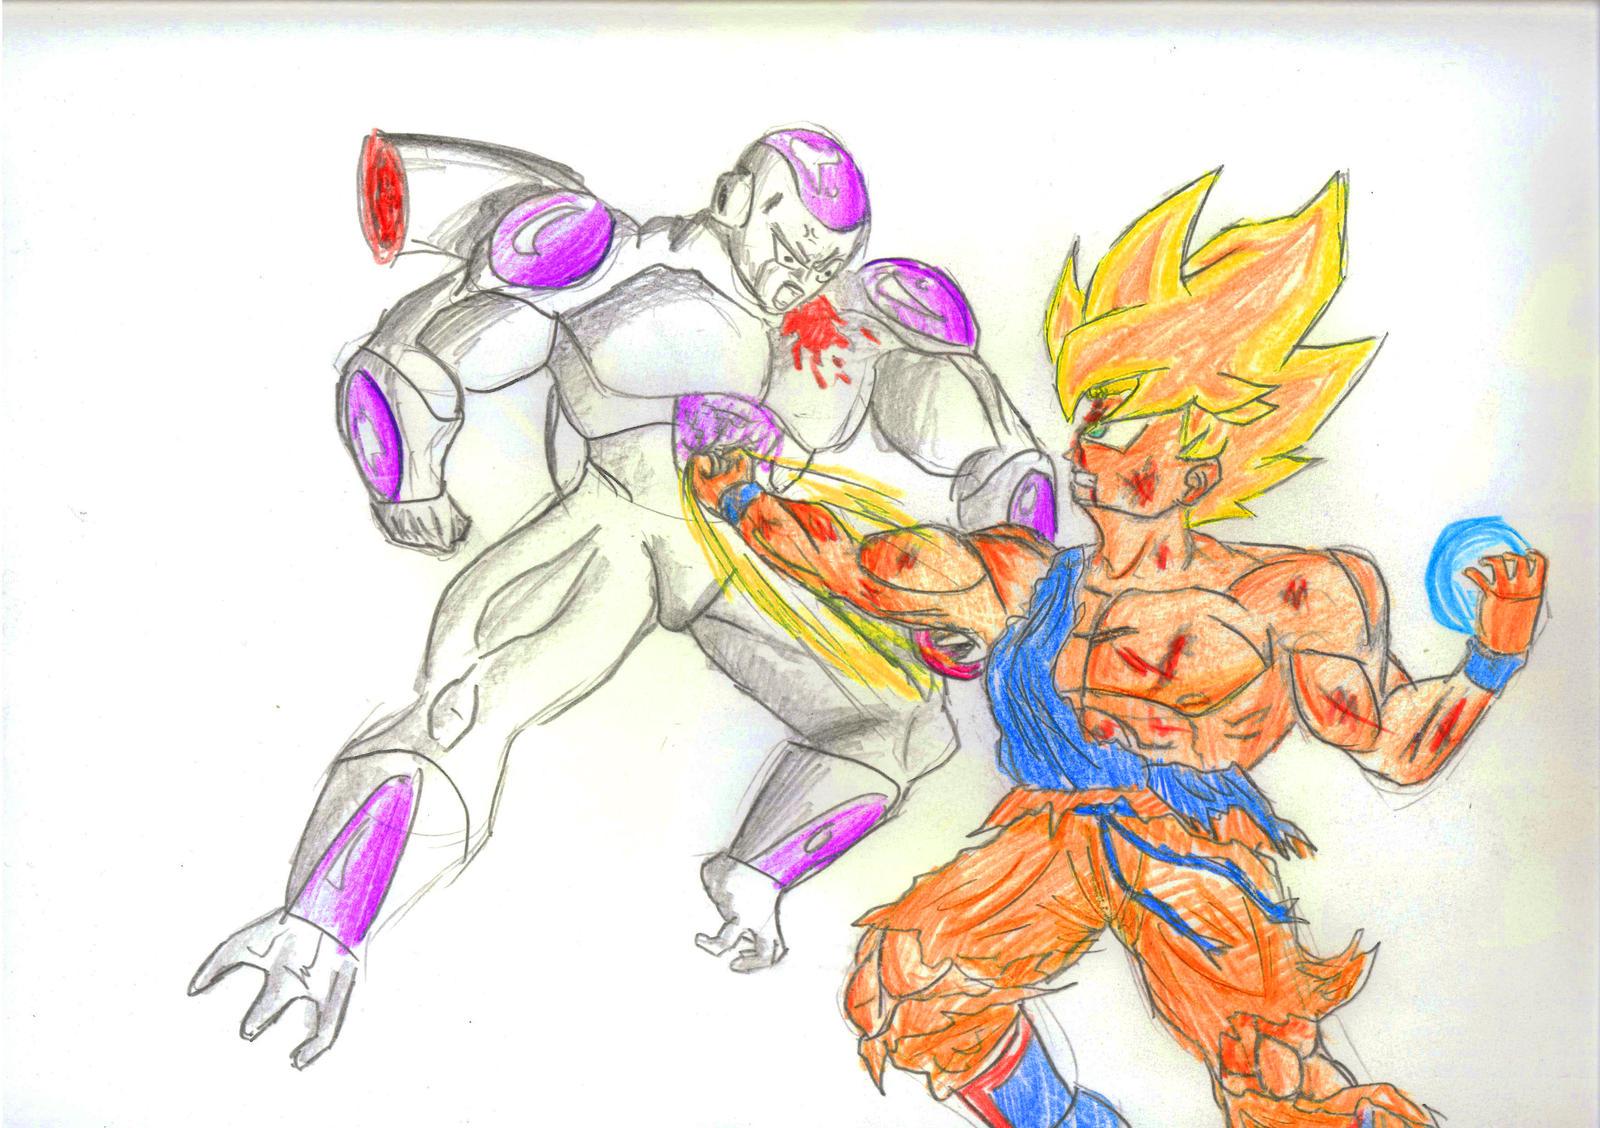 Goku vs Frieza by dragickrstajic on DeviantArt - photo#28